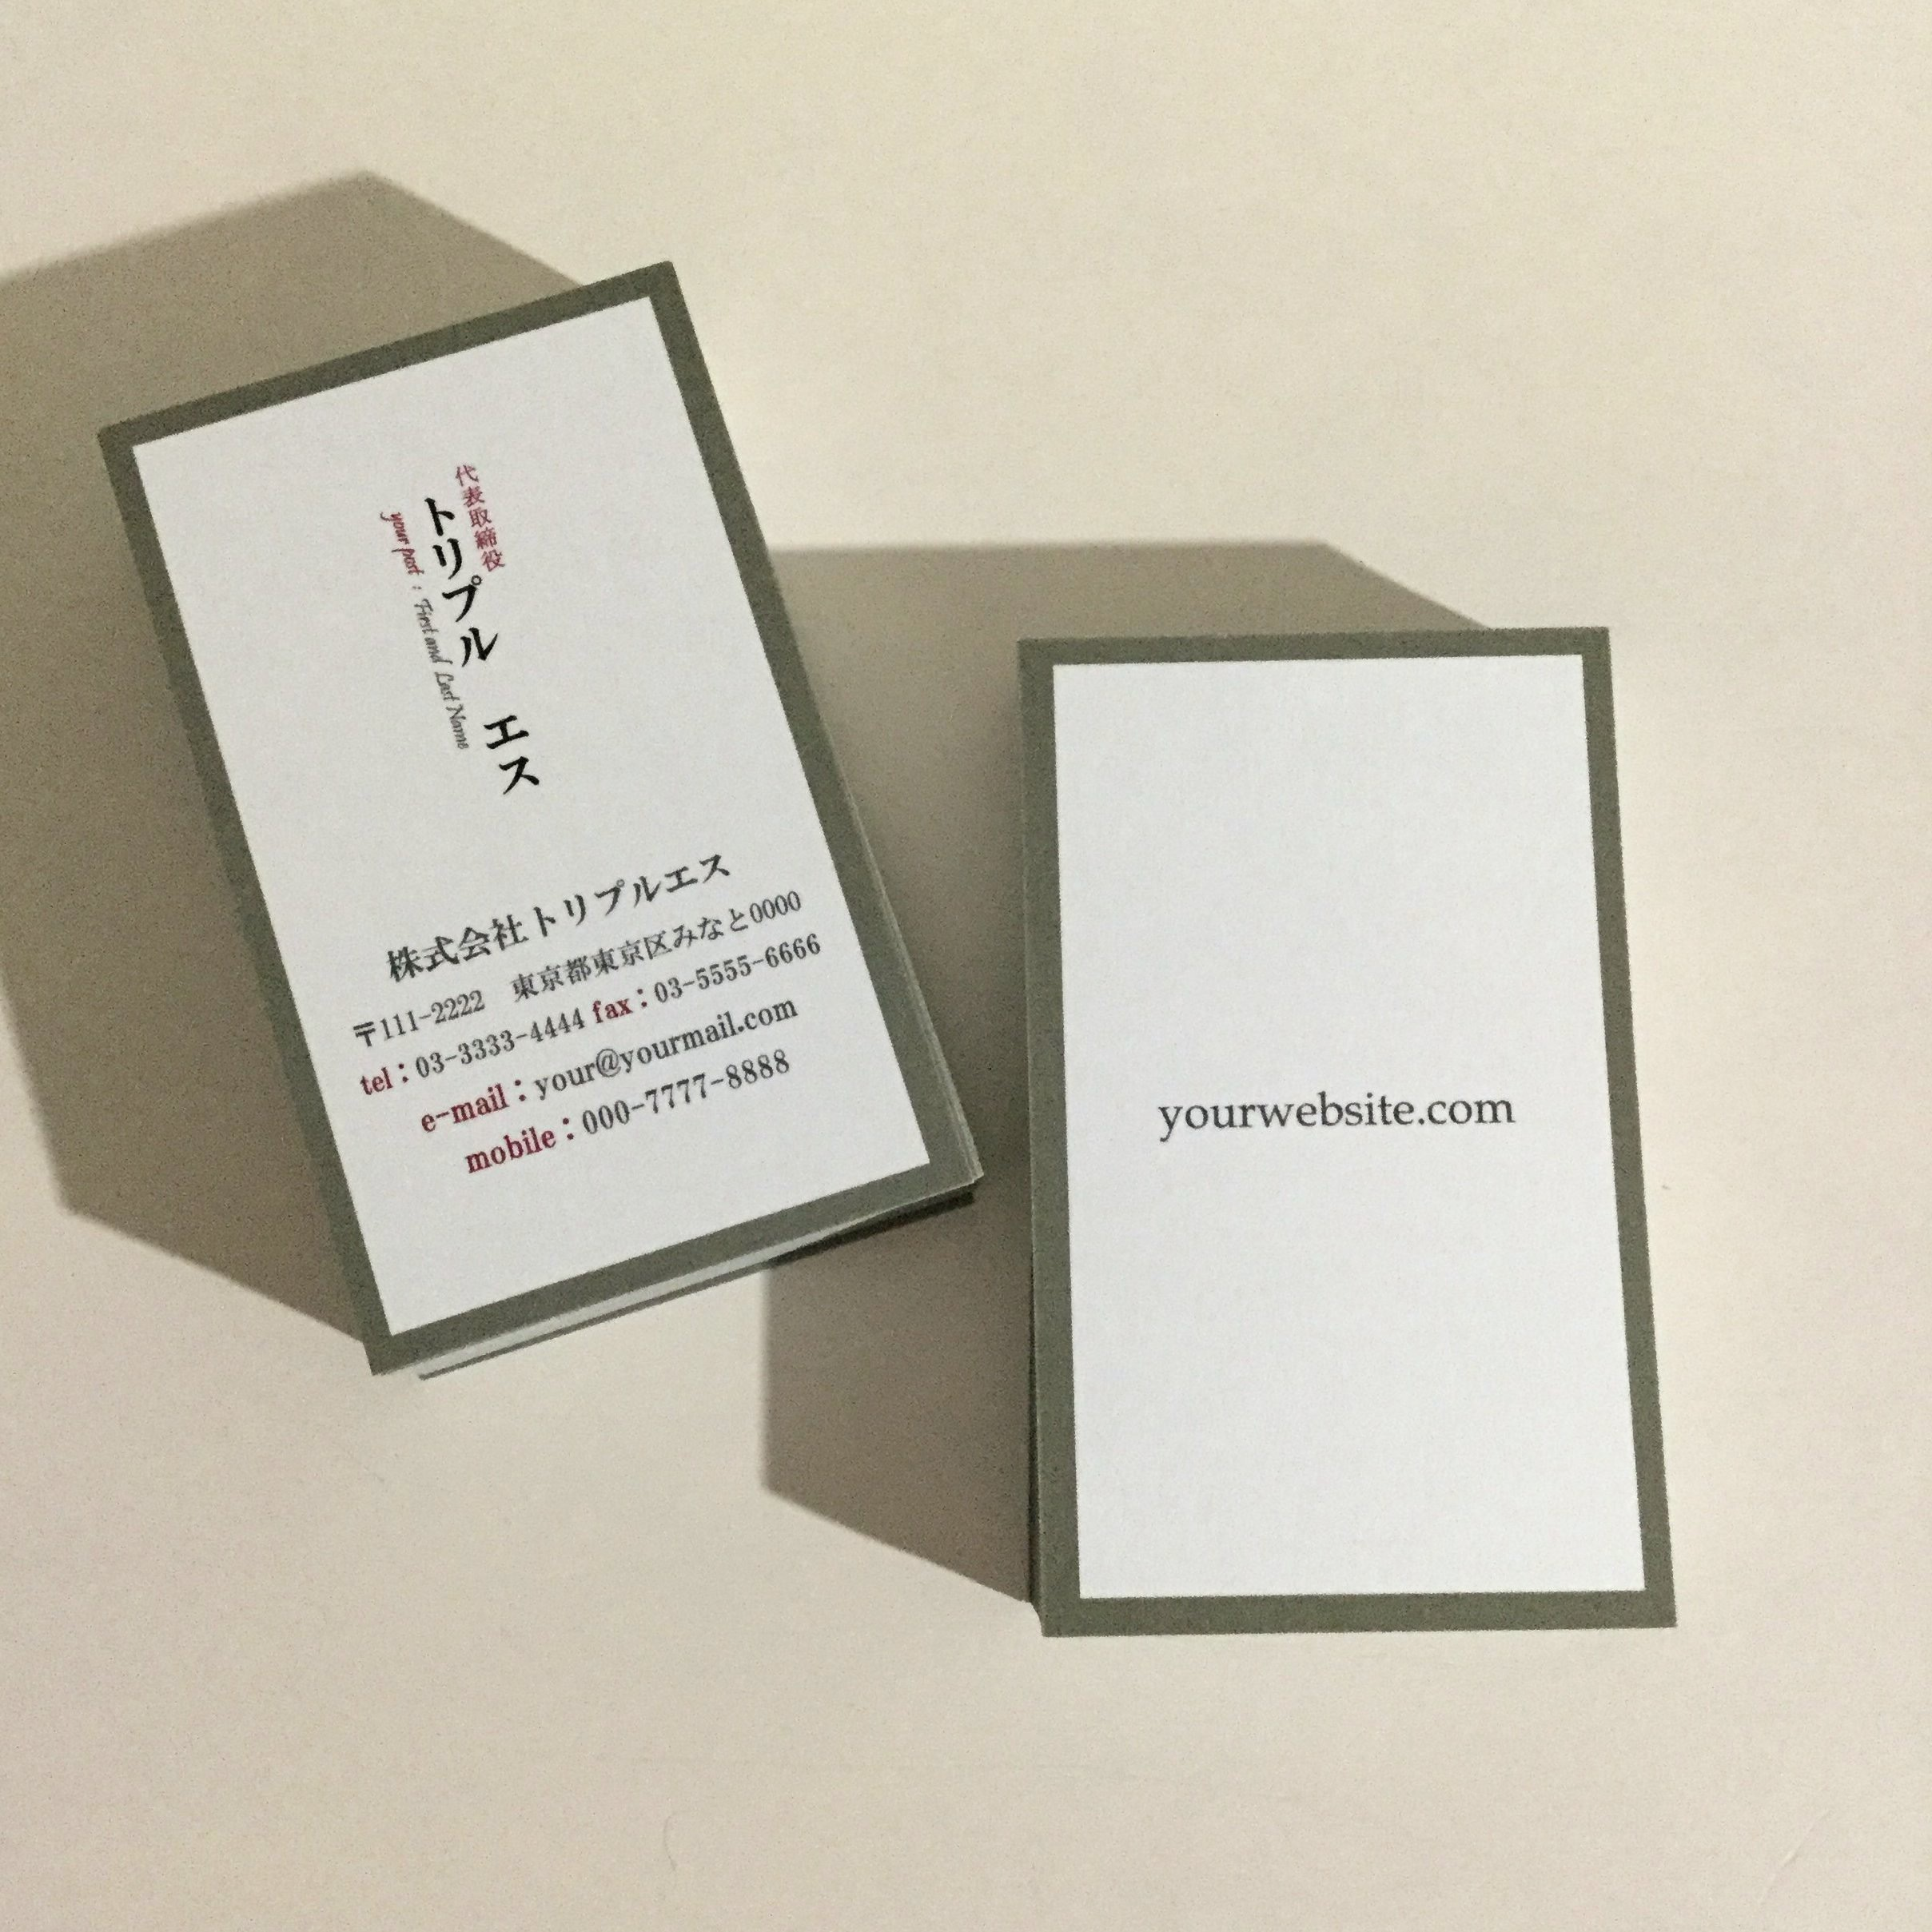 03d3_gry 【100枚】ビジネス名刺【英表記】